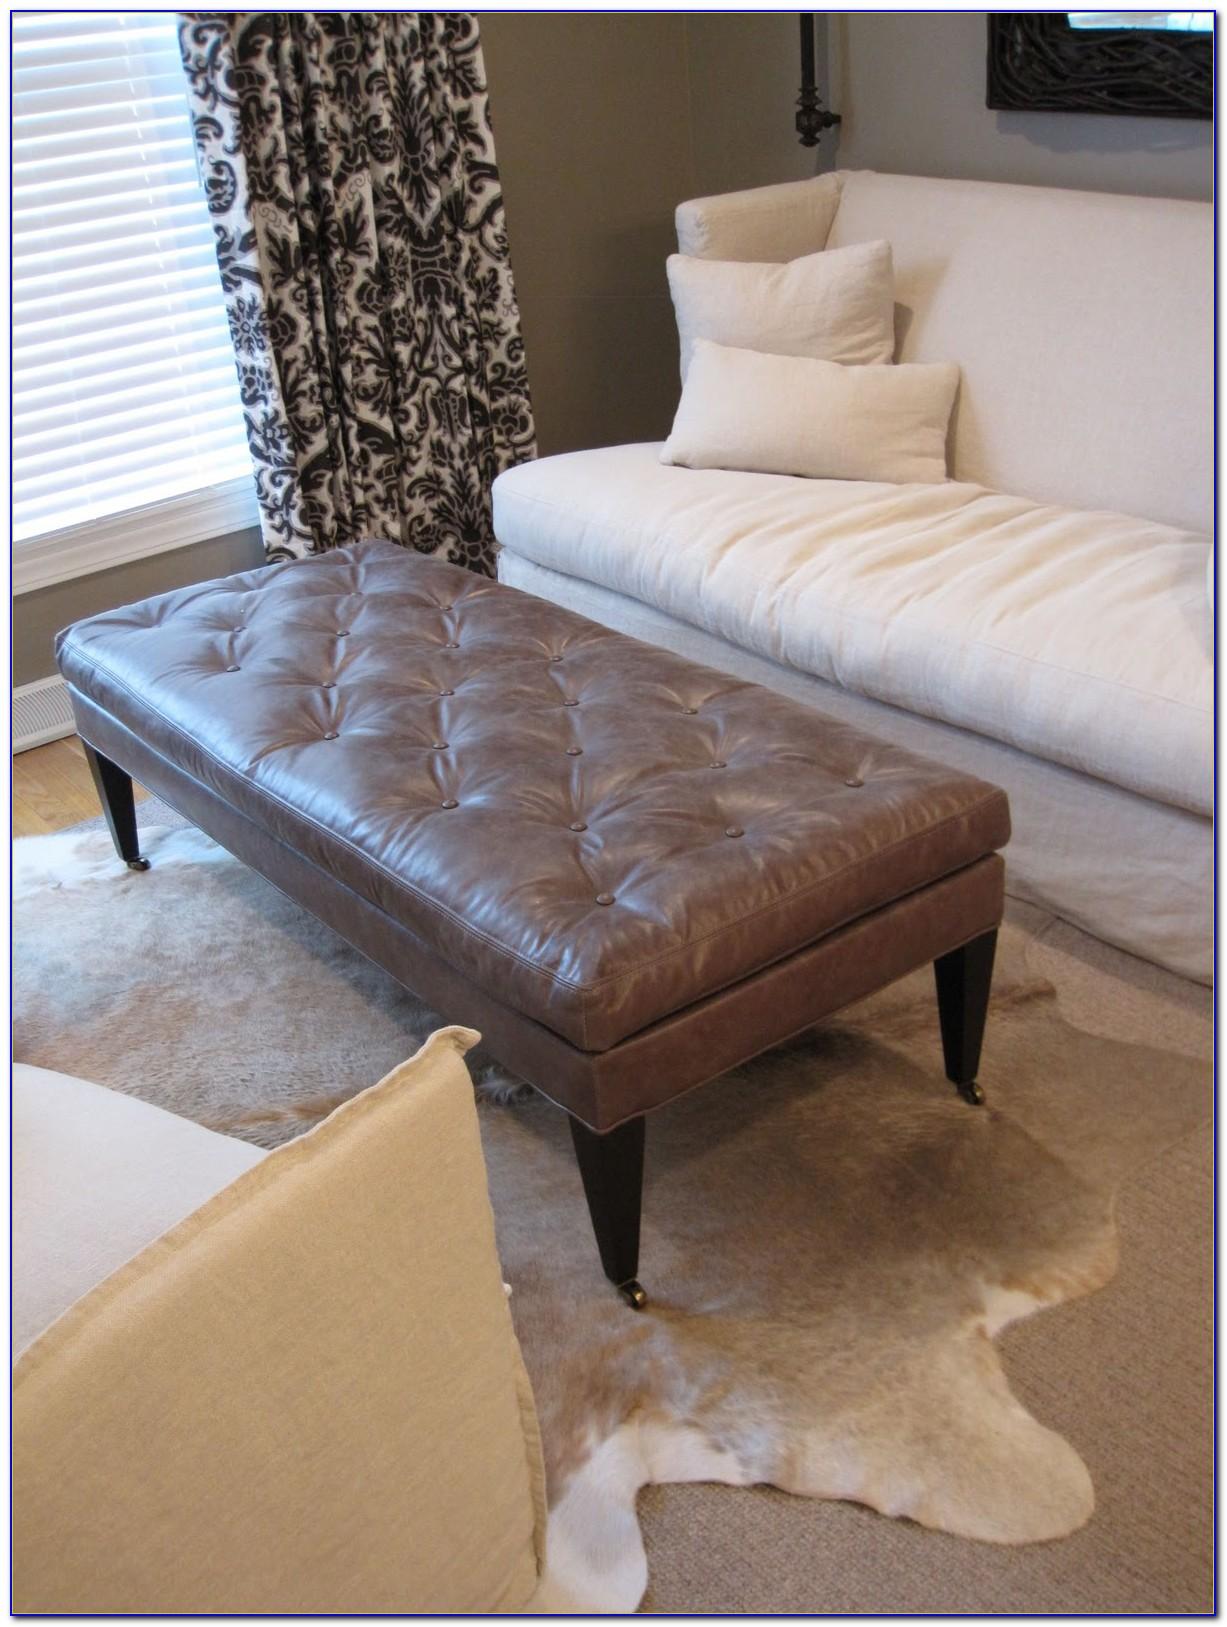 cowhide rug ikea uk rugs home design ideas a8d7wa4dog56689. Black Bedroom Furniture Sets. Home Design Ideas